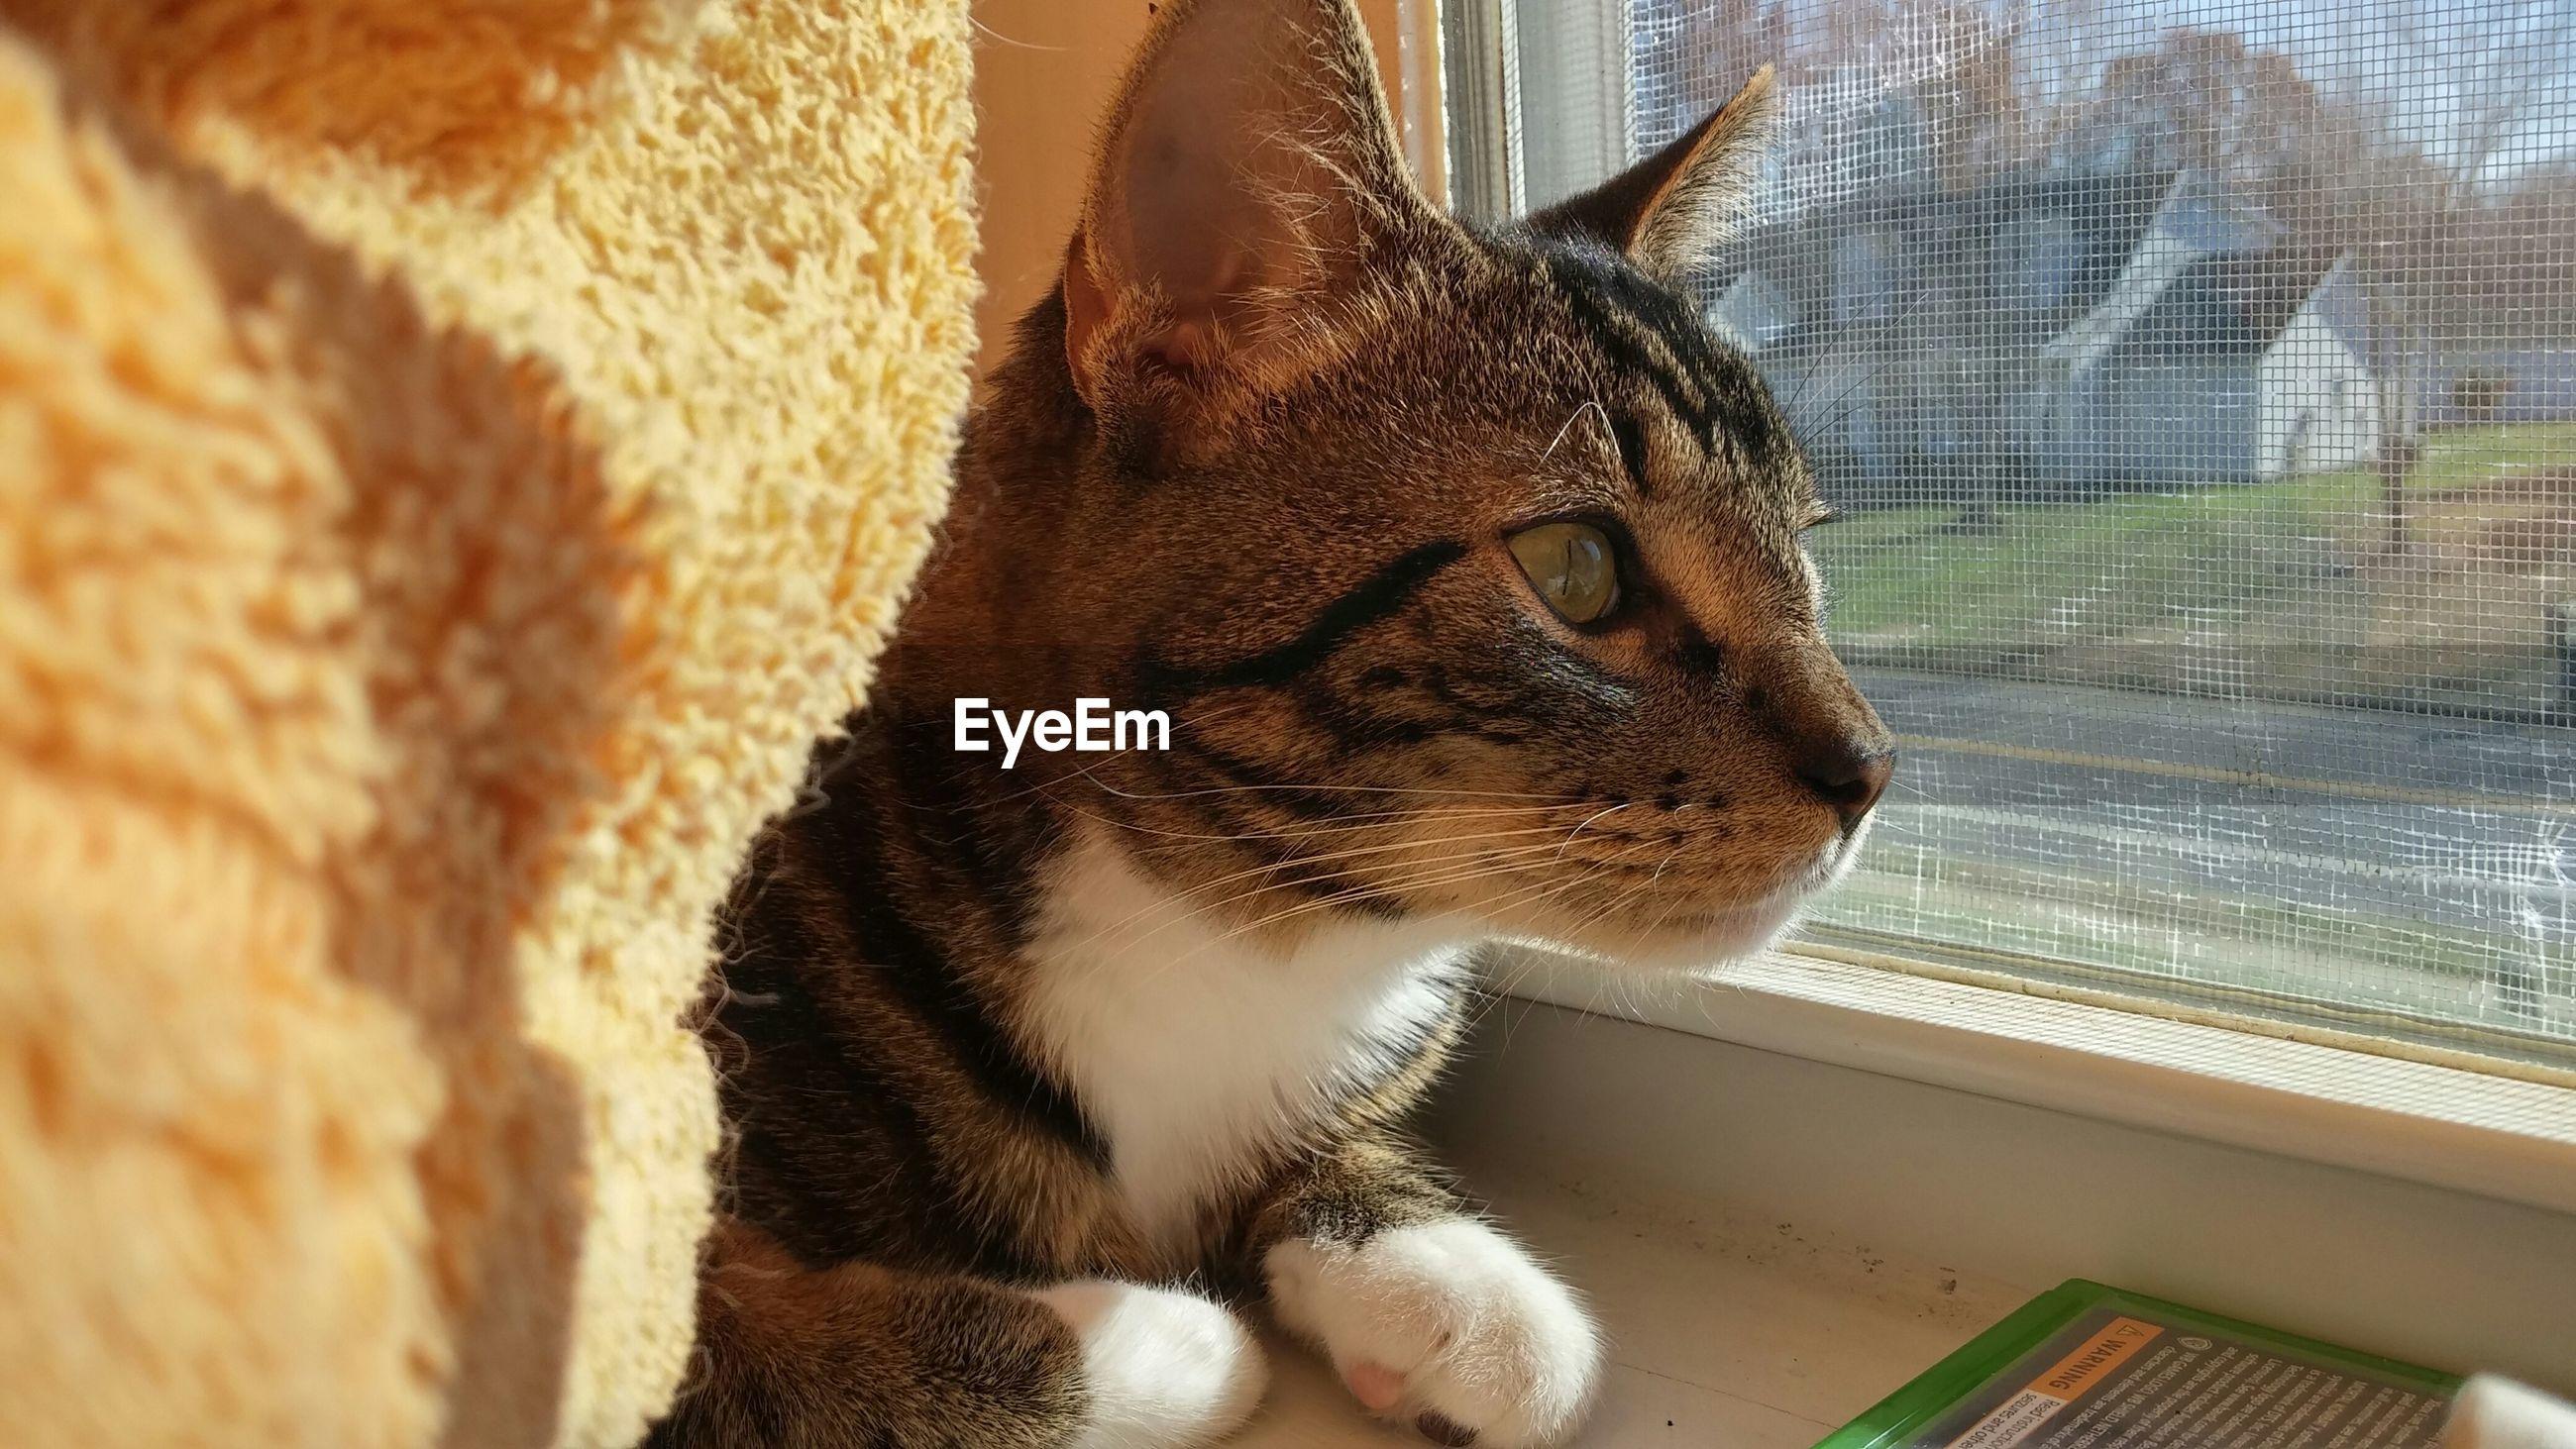 Close-up of cat sitting on window